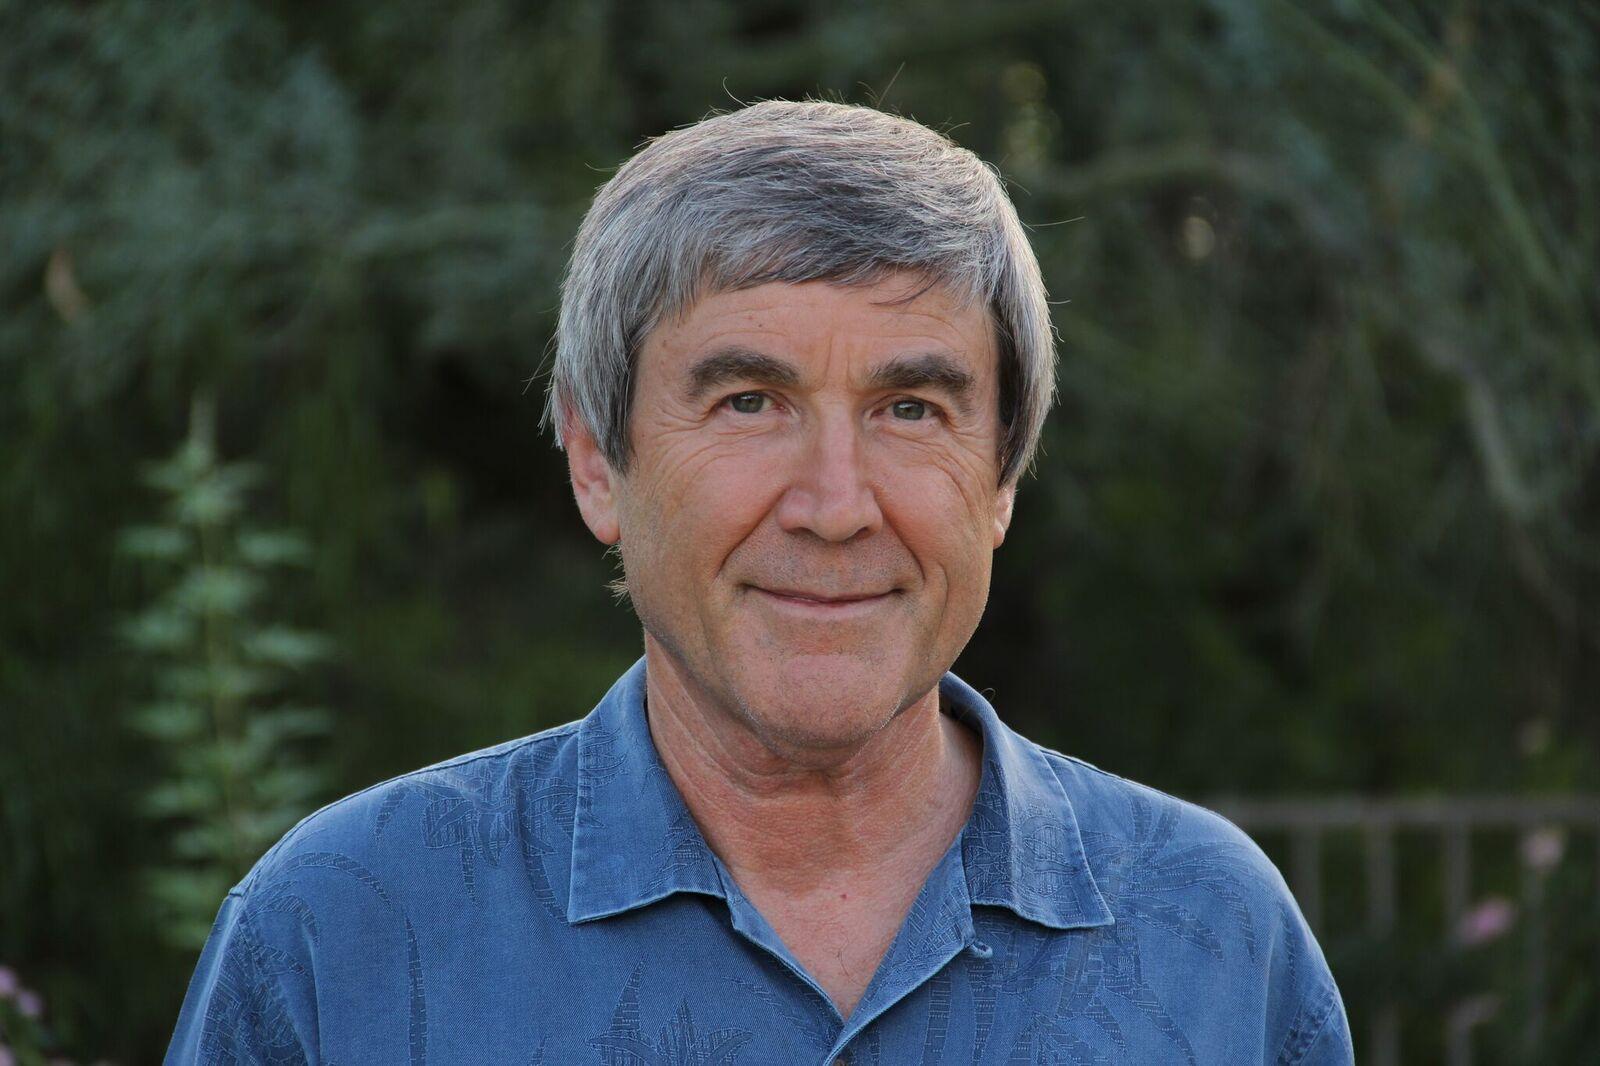 Dr. Paul Davies